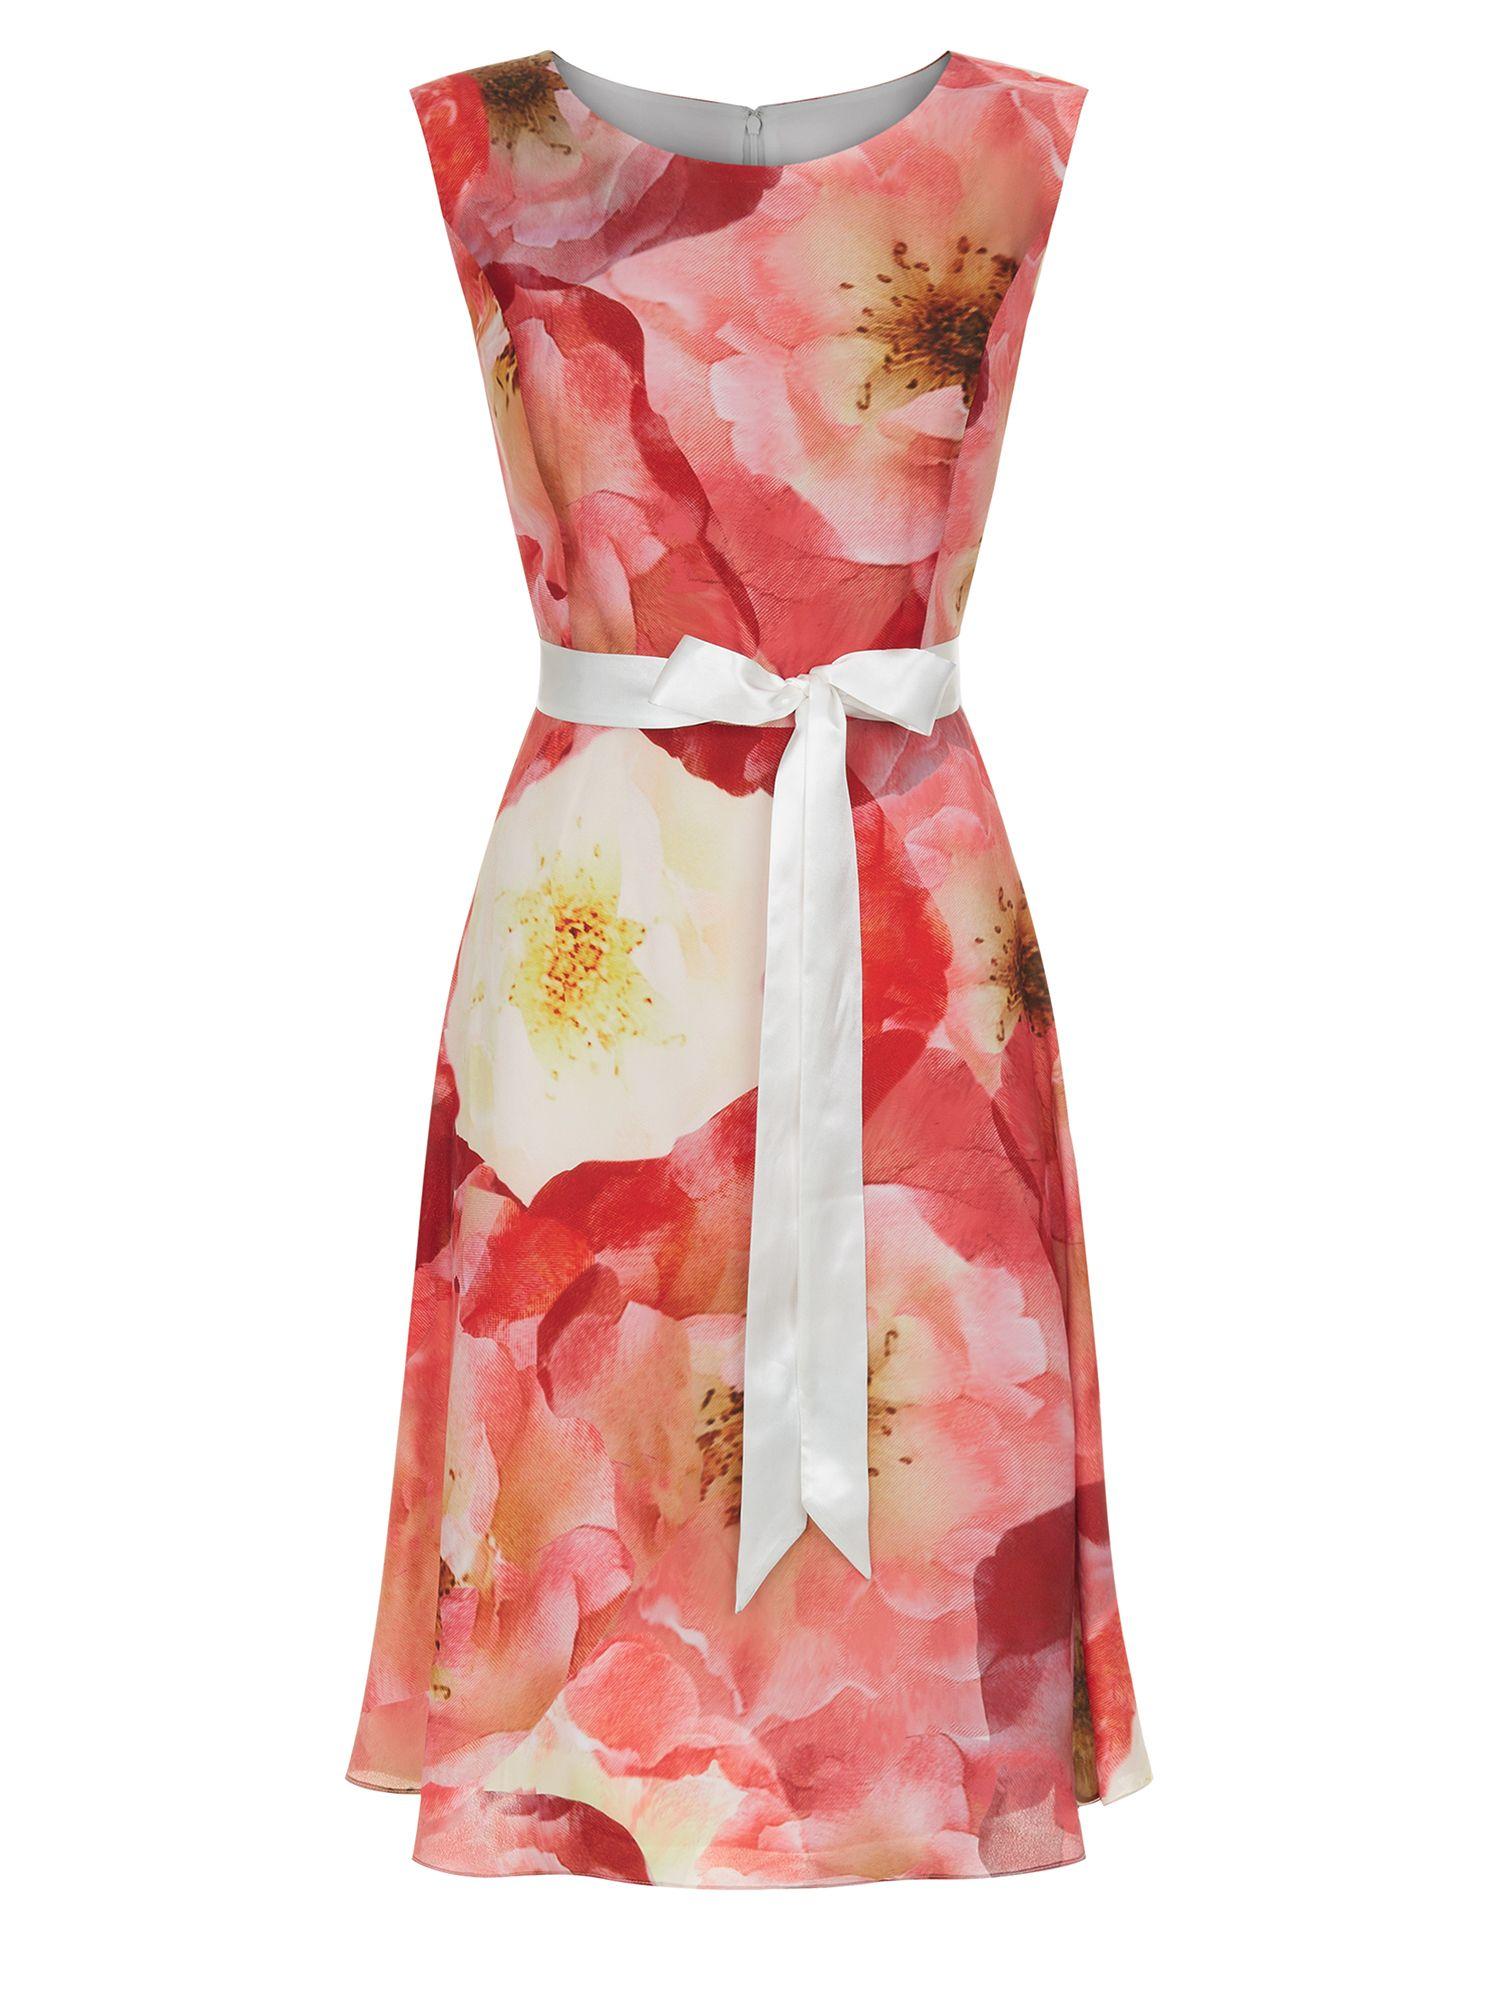 Cocktail dresses for summer wedding  OVER EXPOSED POPPY DRESS  Closet Covets  Warm Season  Pinterest